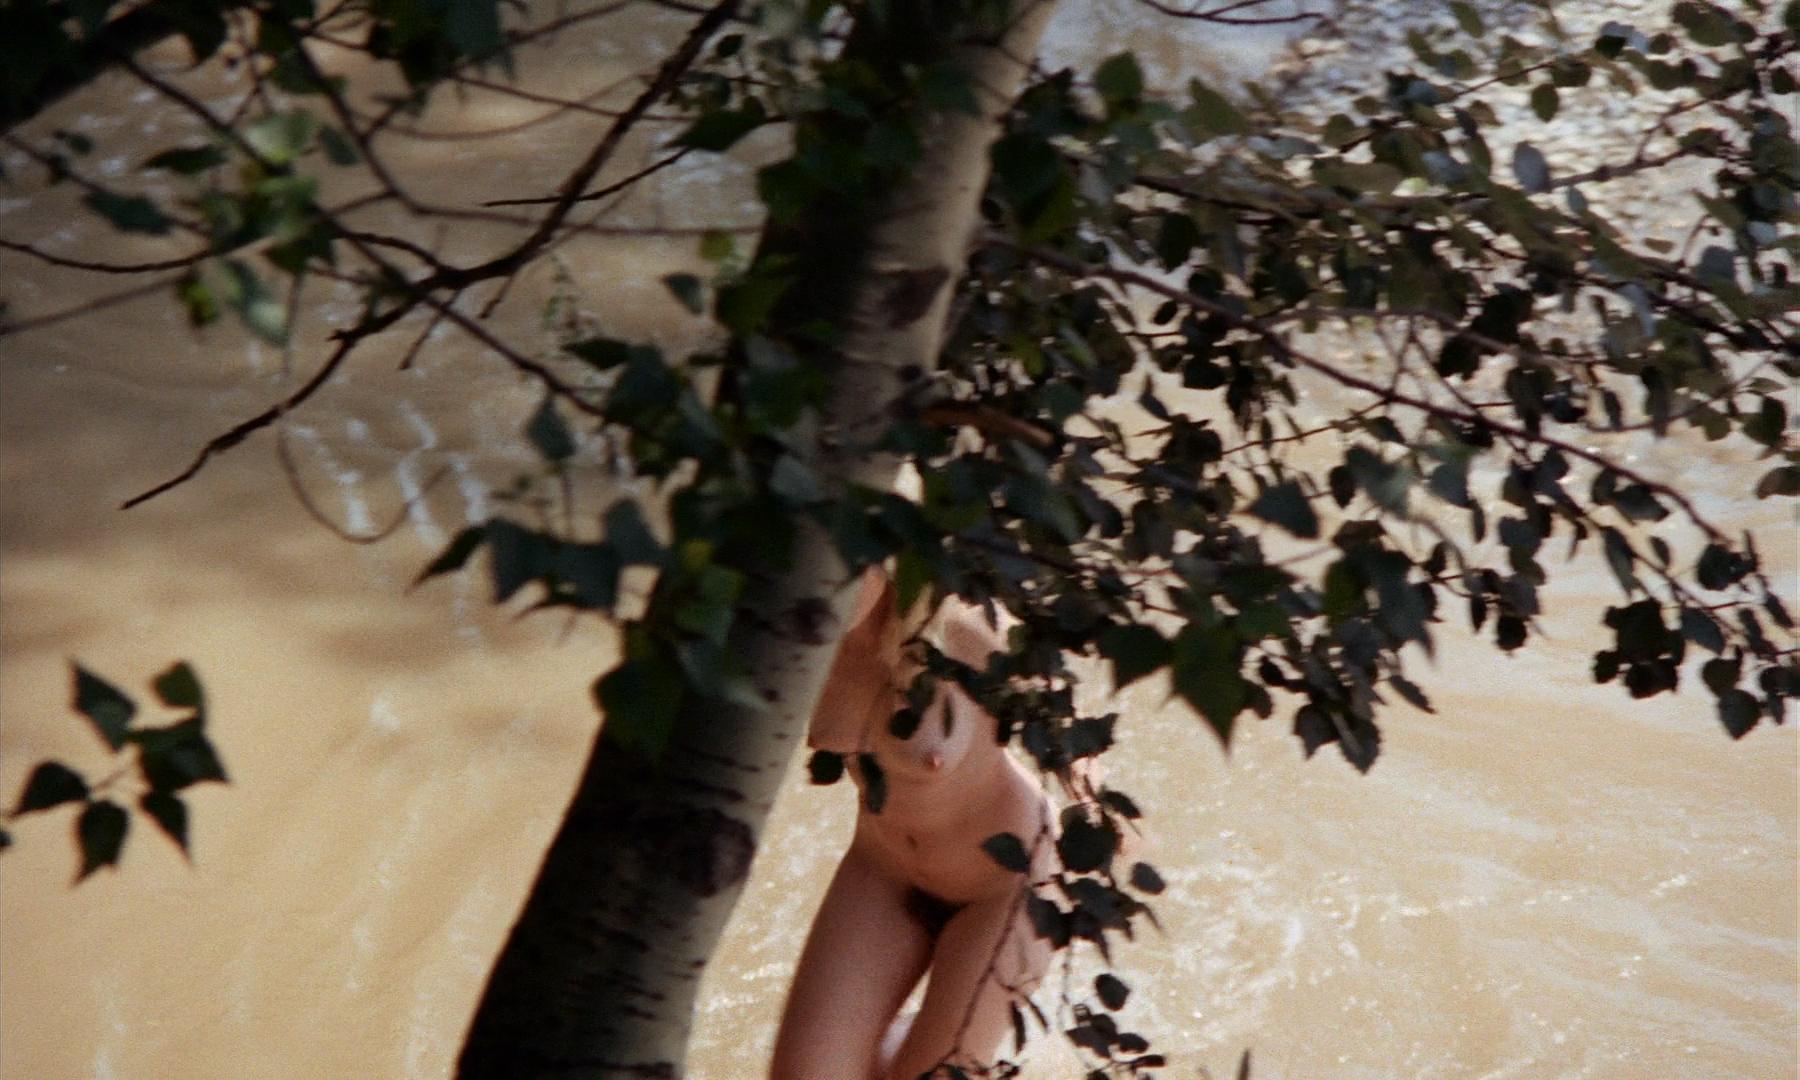 Romina Power nude toplees, Sylva Koscina nude Rosemary Dexter and Maria Rohm nude bush - Marquis de Sade - Justine (IT-1969) HD 1080p BluRay (11)